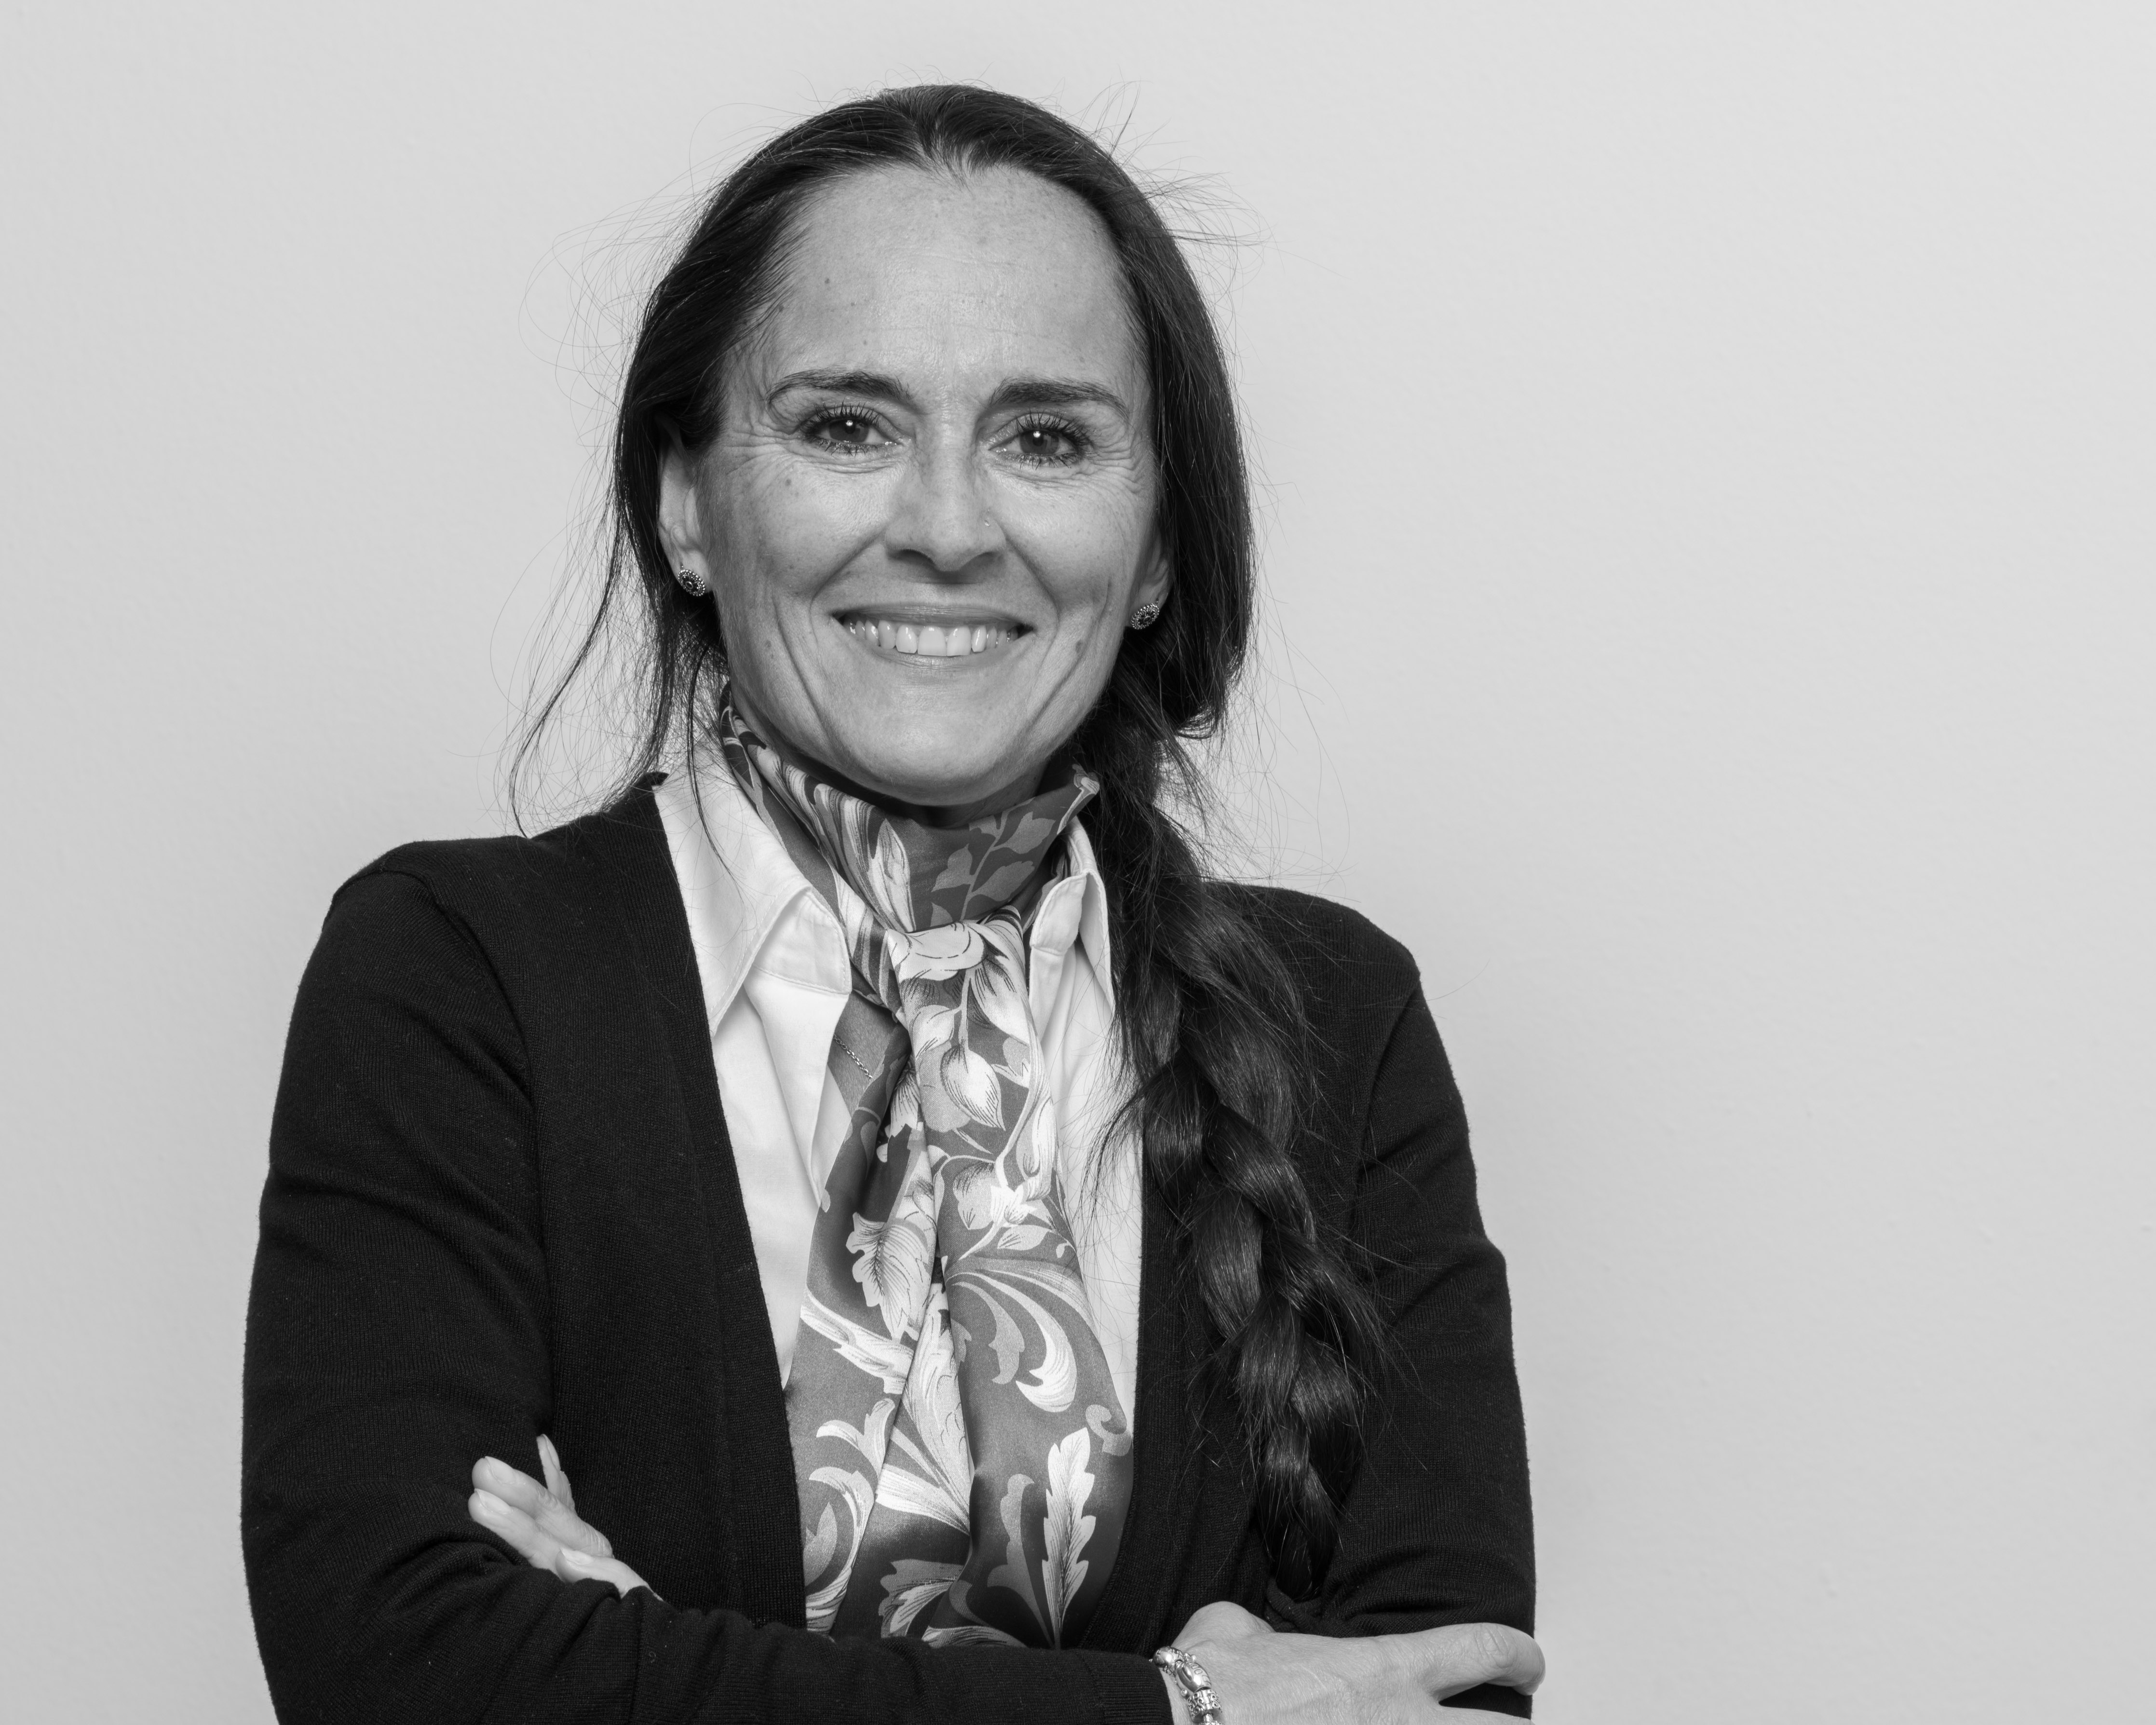 Patrizia Corradini